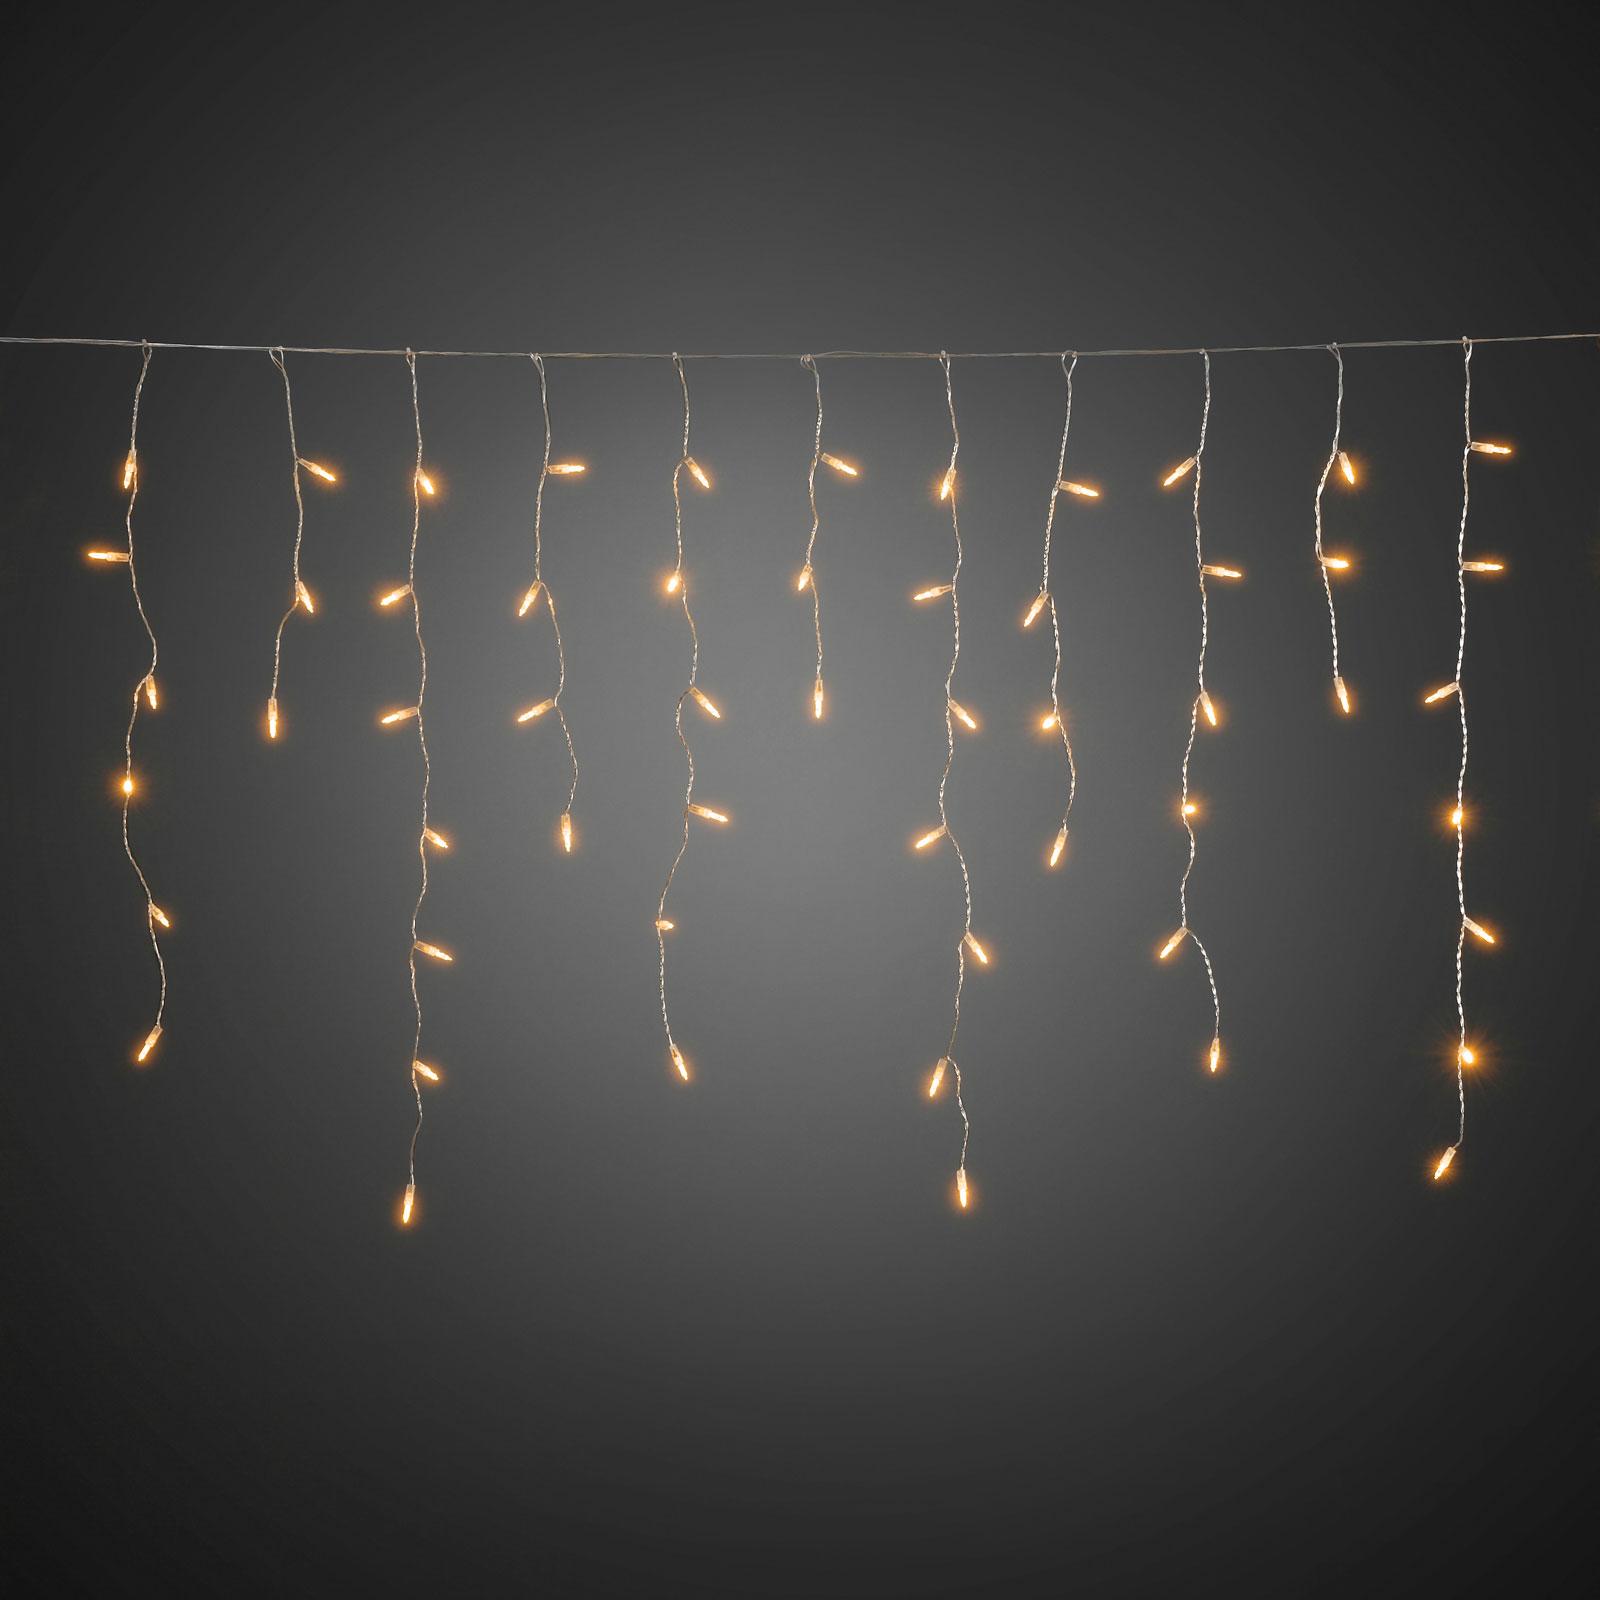 LED-draperi isregn för utomhusbruk